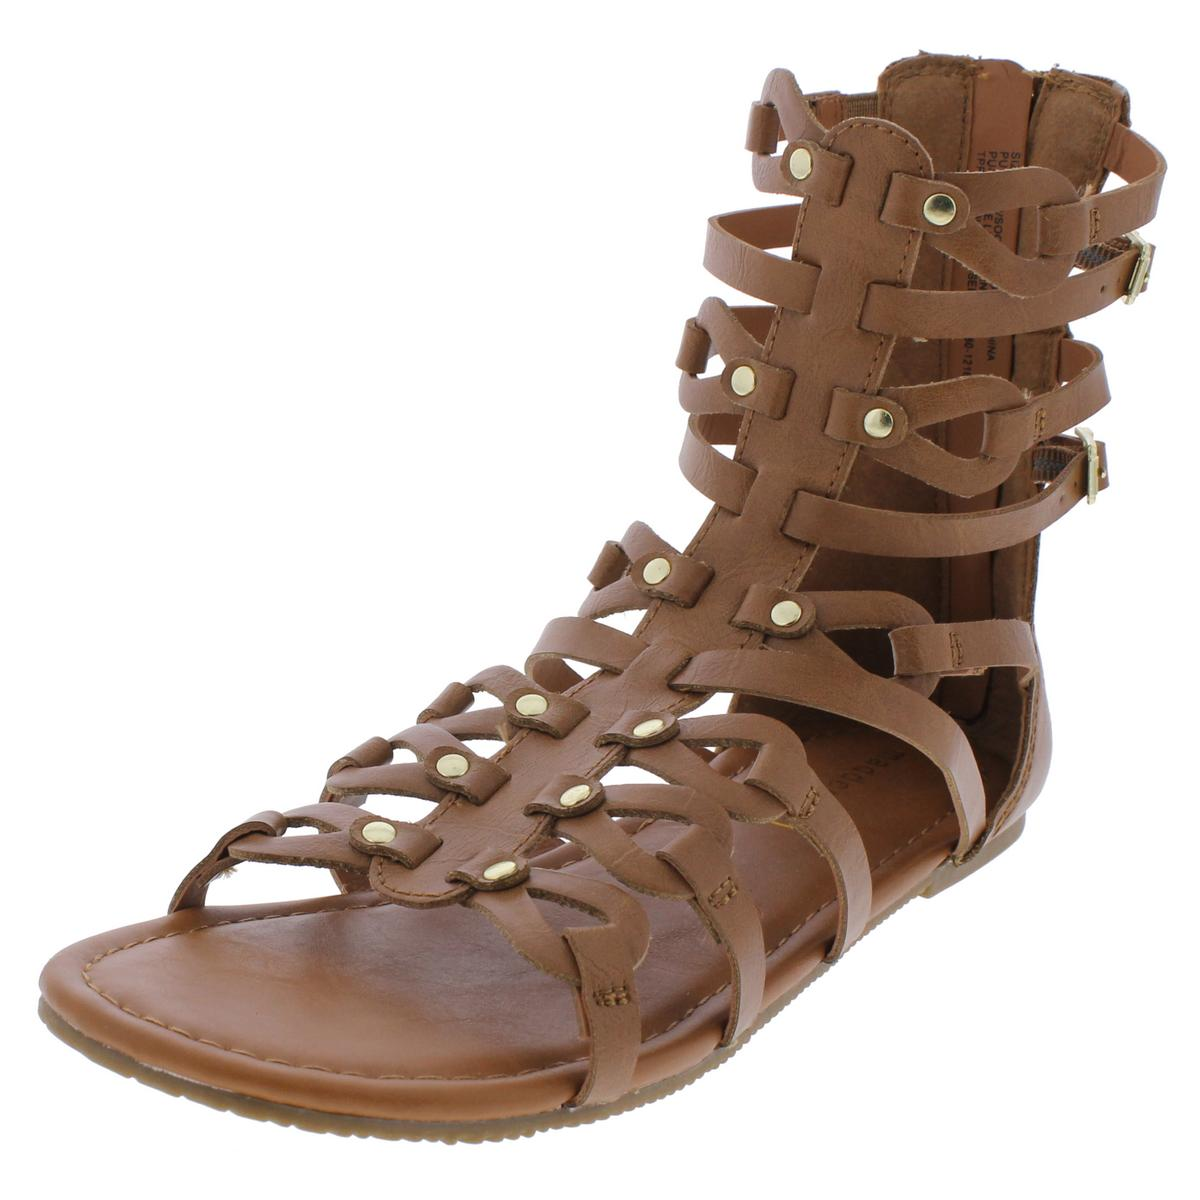 66c1f599ce5 Details about Madden Girl by Steve Madden Girls SERENTE Flat Gladiator  Sandals Flats BHFO 0226